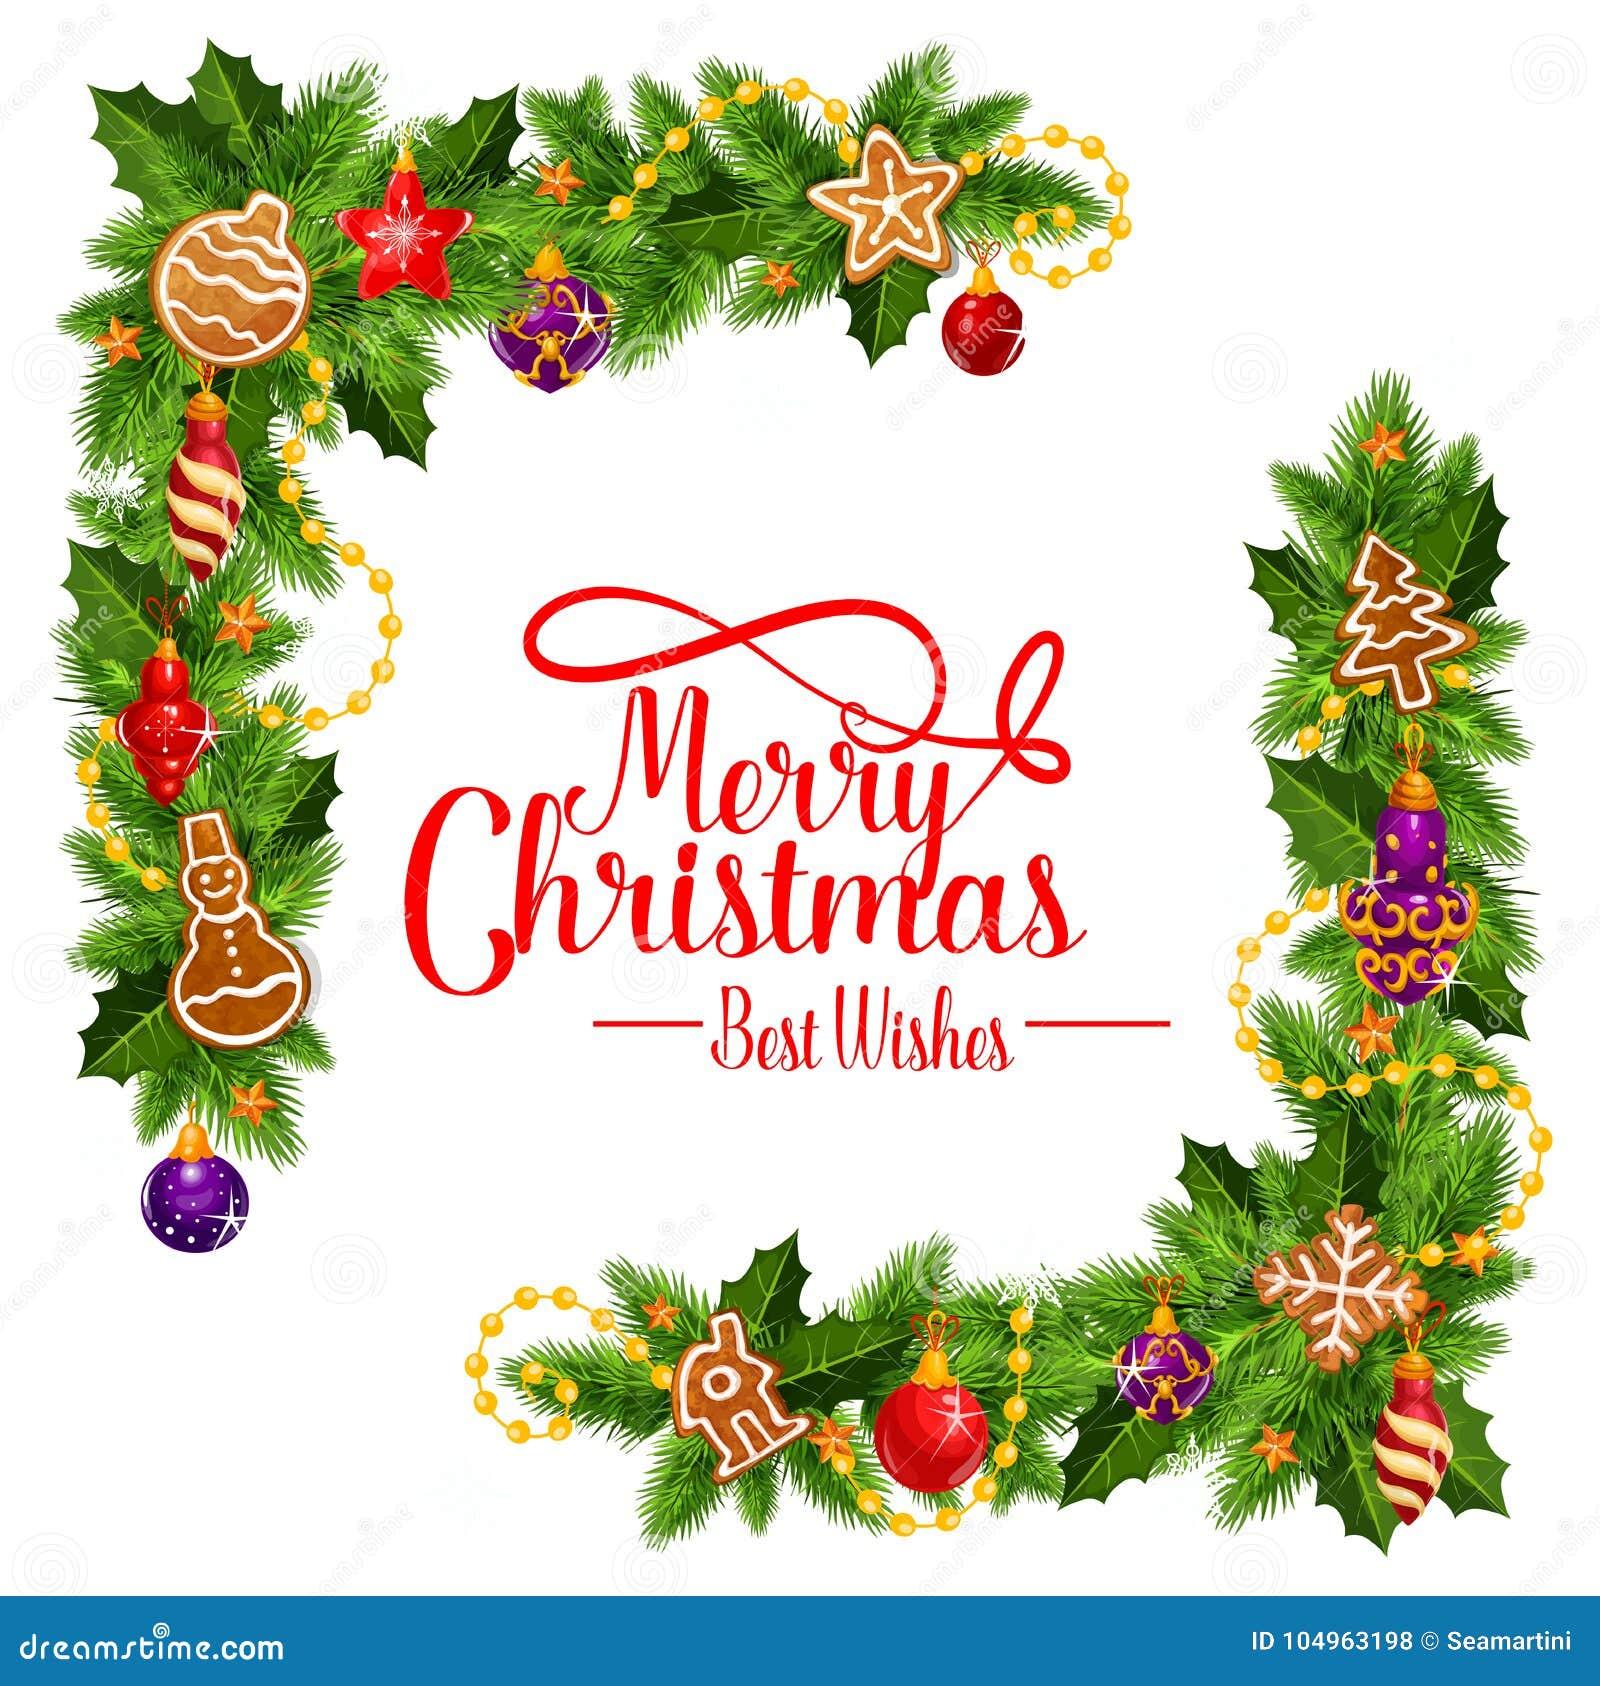 Merry Christmas Vector Frame Wreath Stock Vector - Illustration of ...